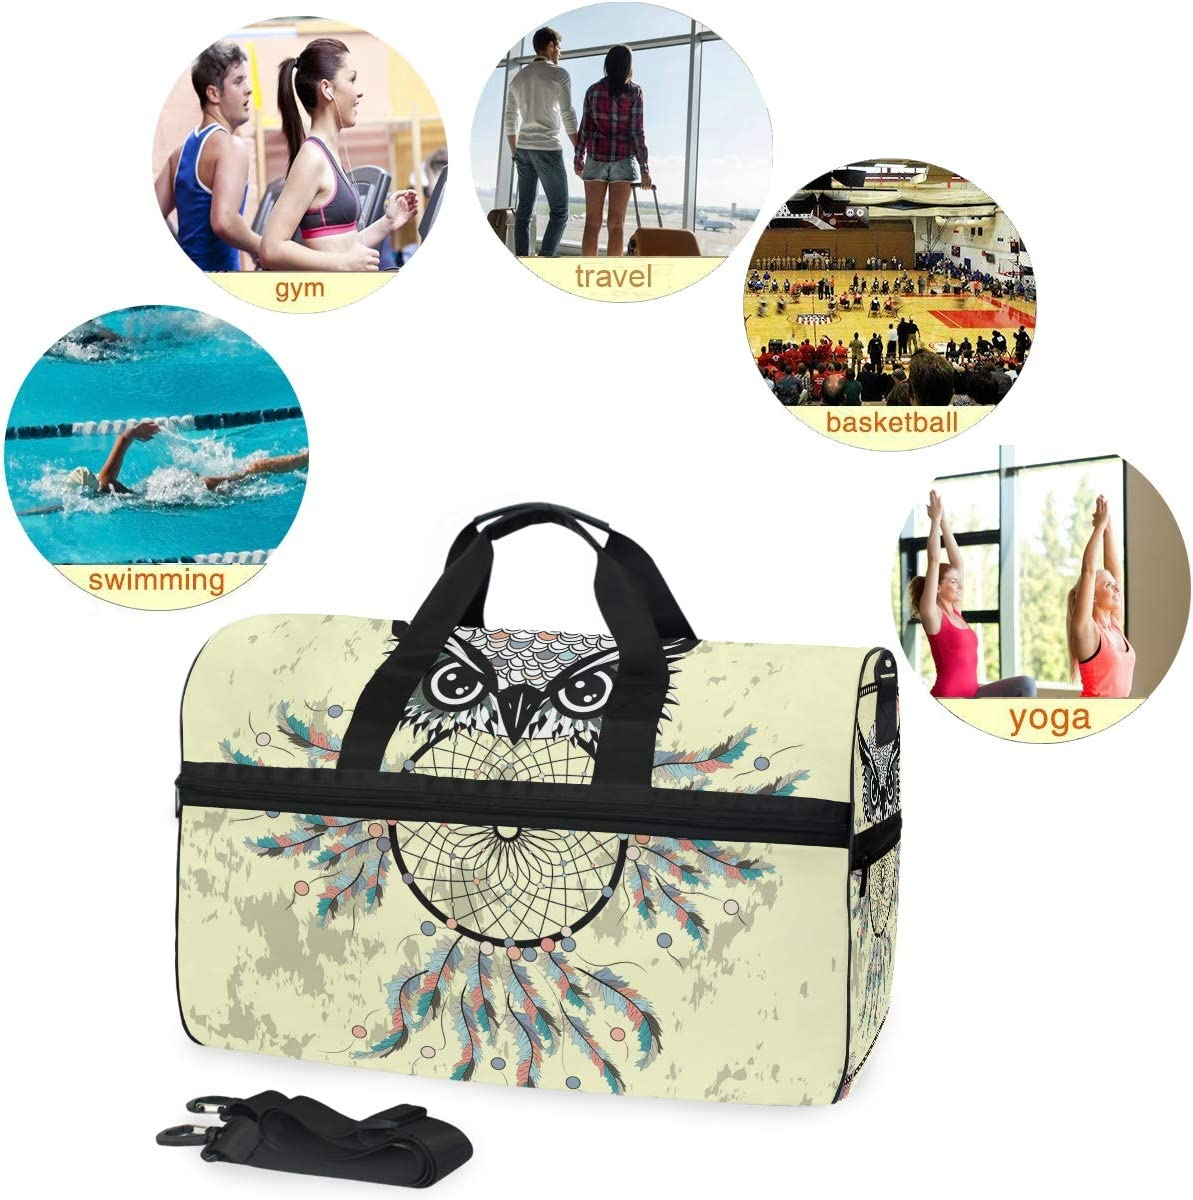 WIHVE Gym Bag with Shoes Compartment Dream Catcher Owl Arrow Travel Duffel Bag